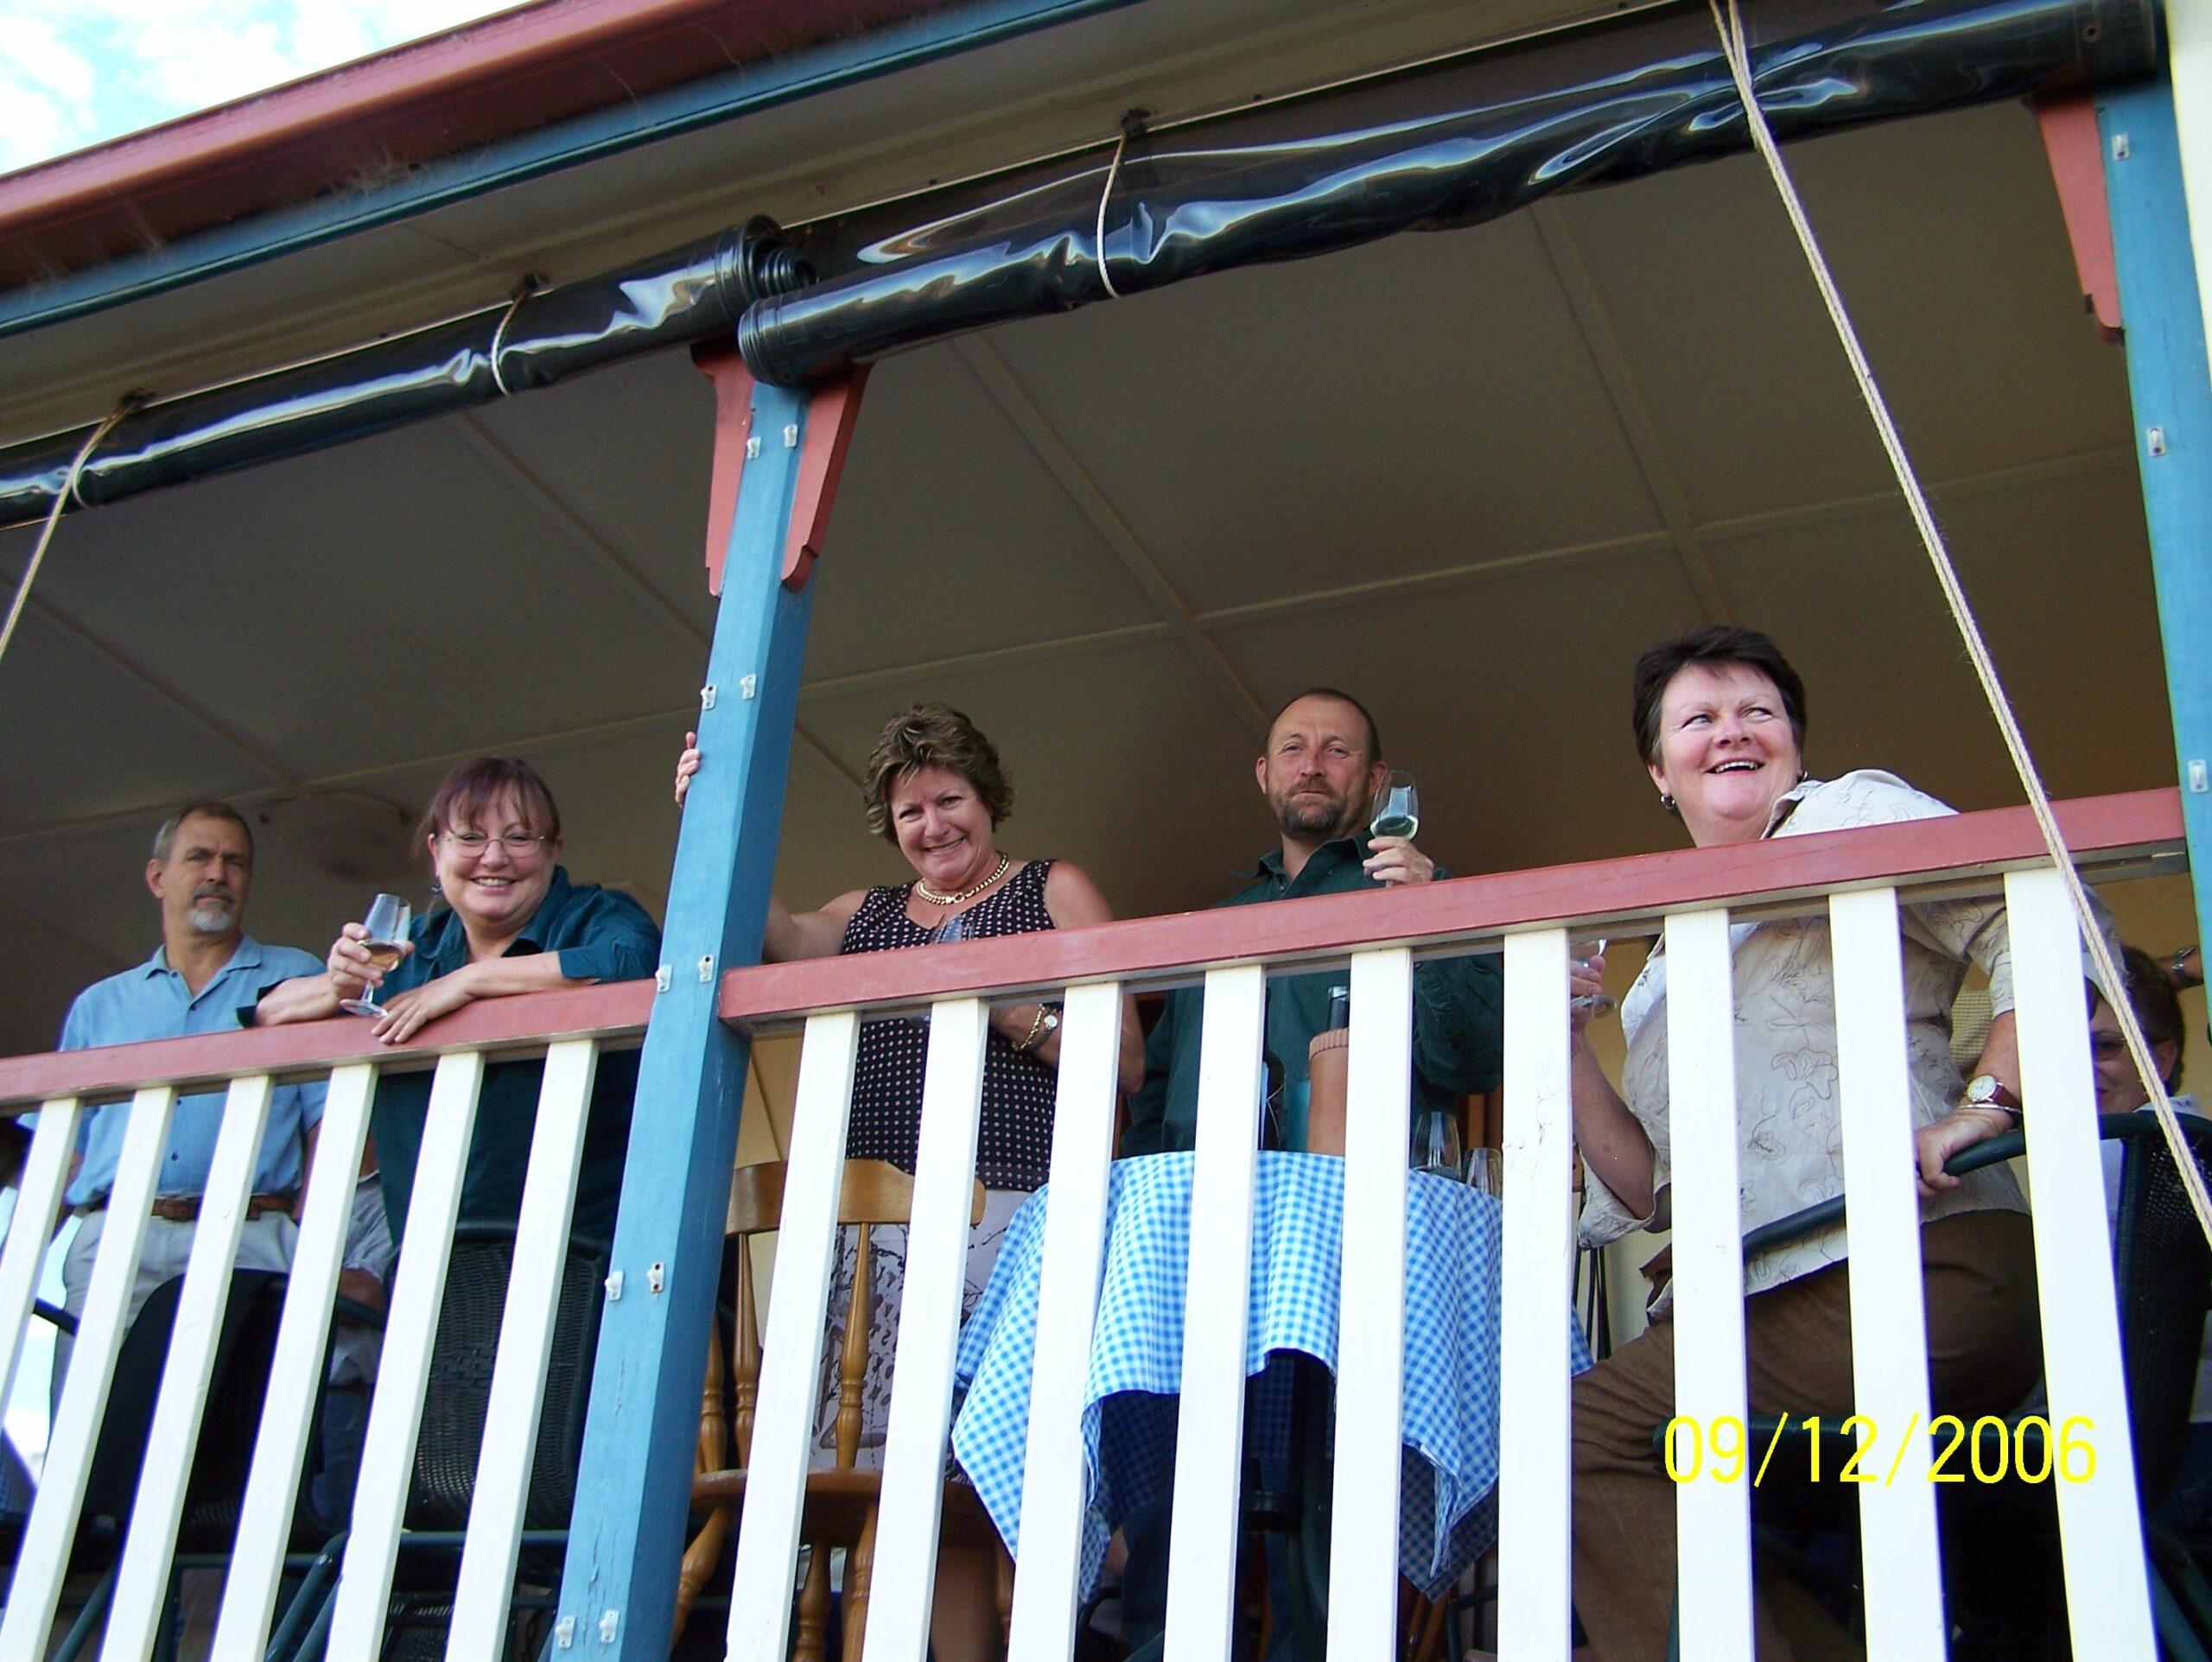 2006 Carrollee Hotel